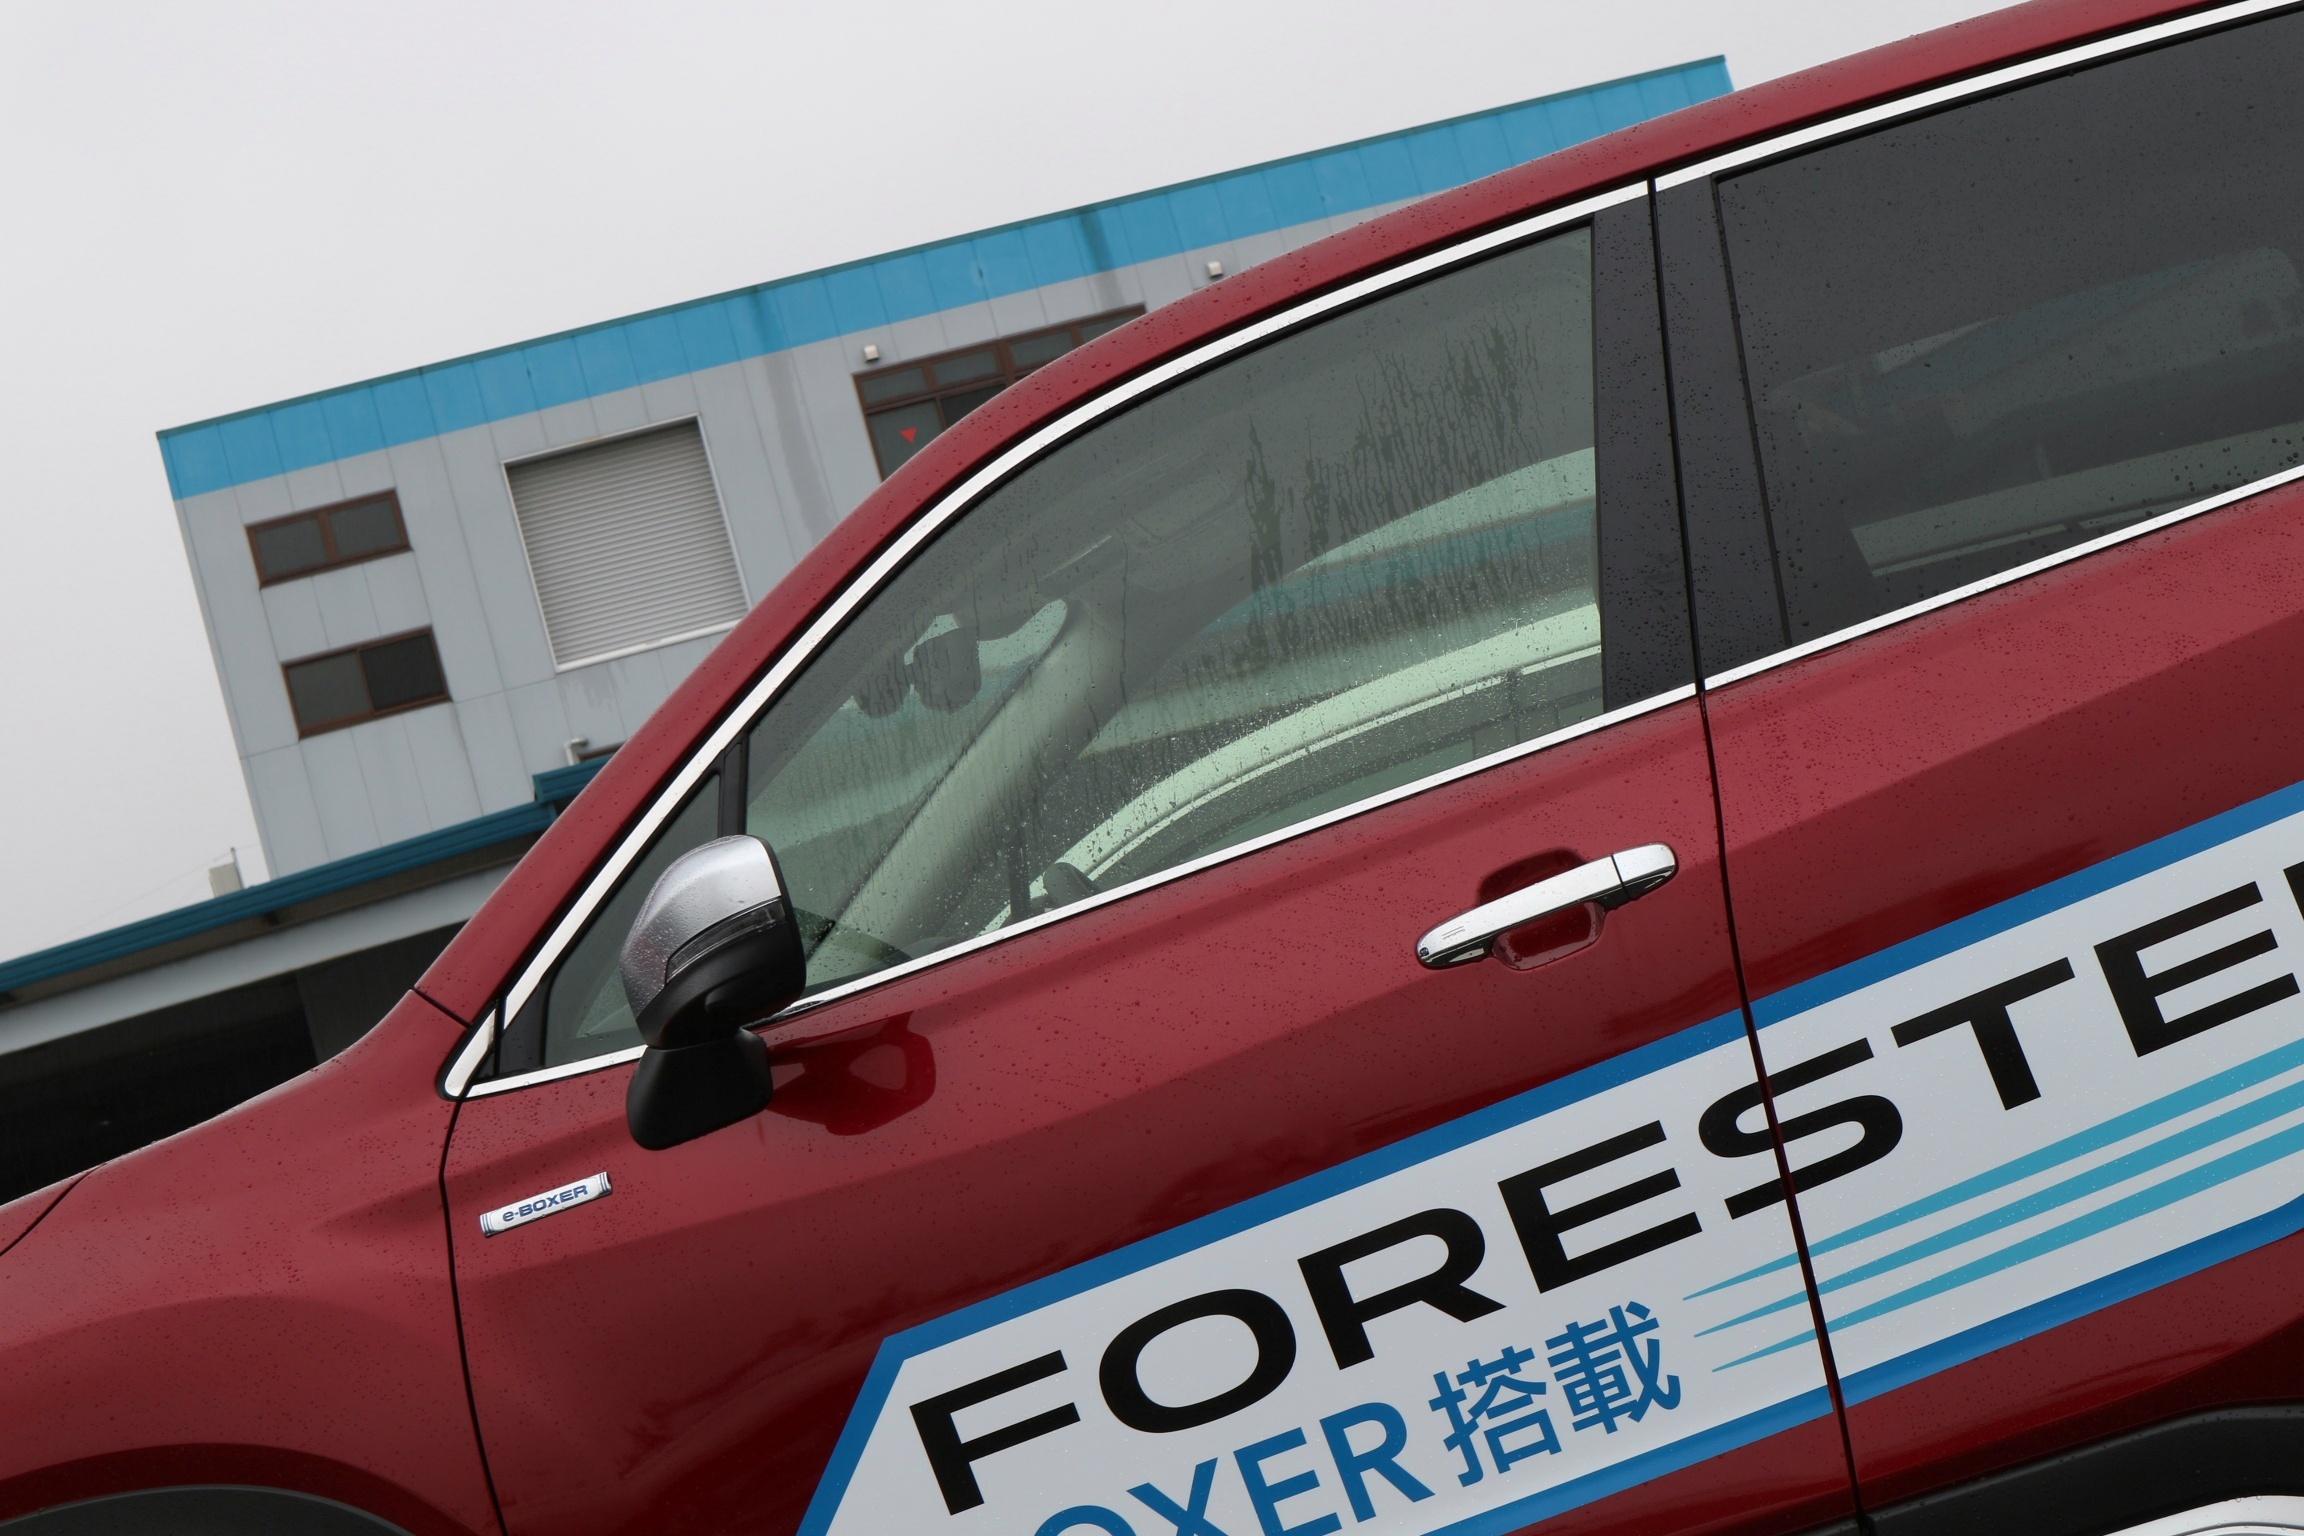 forester7.jpeg